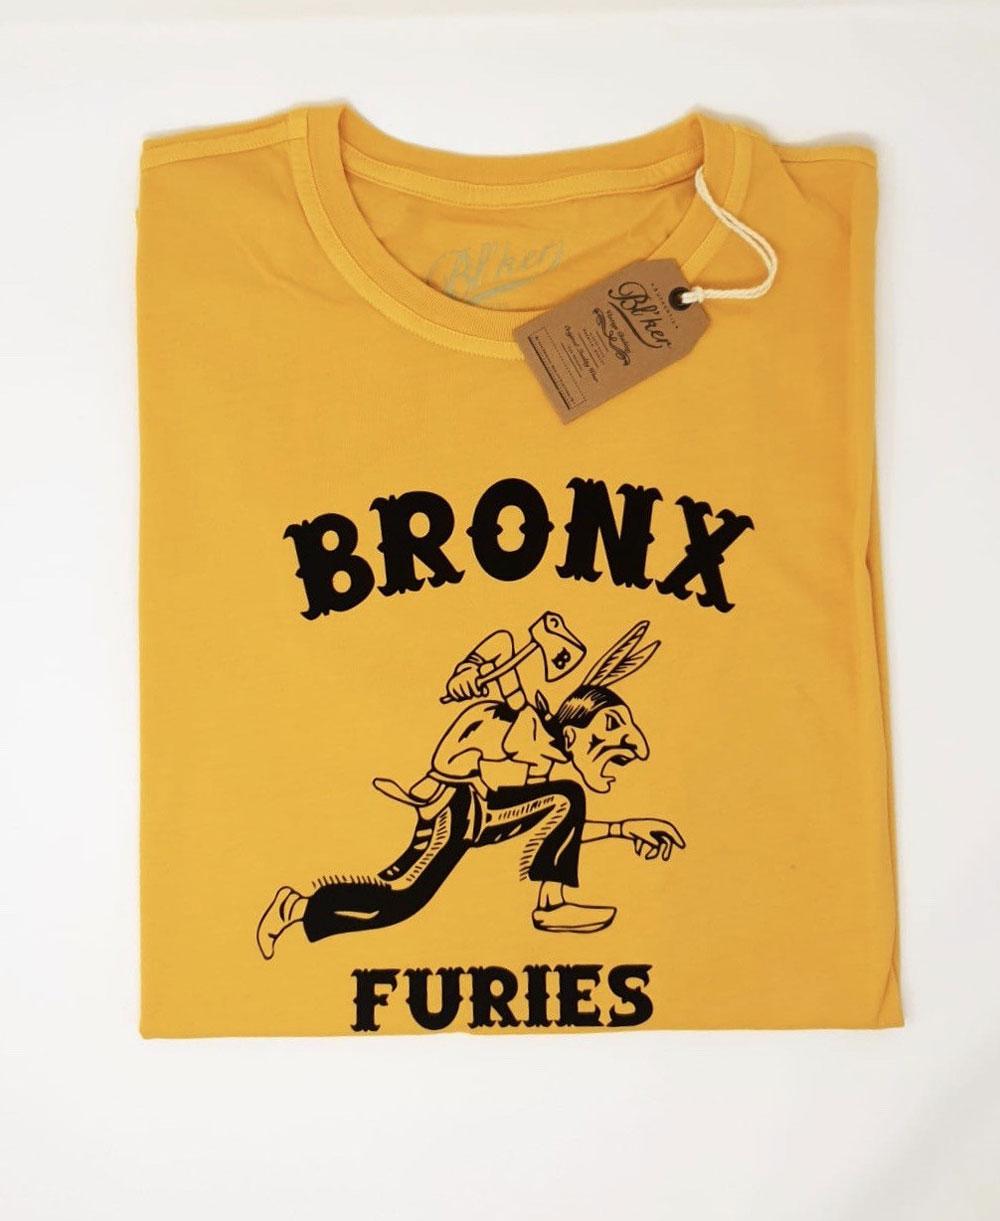 Bronx Furies Camiseta Manga Corta para Hombre Yellow